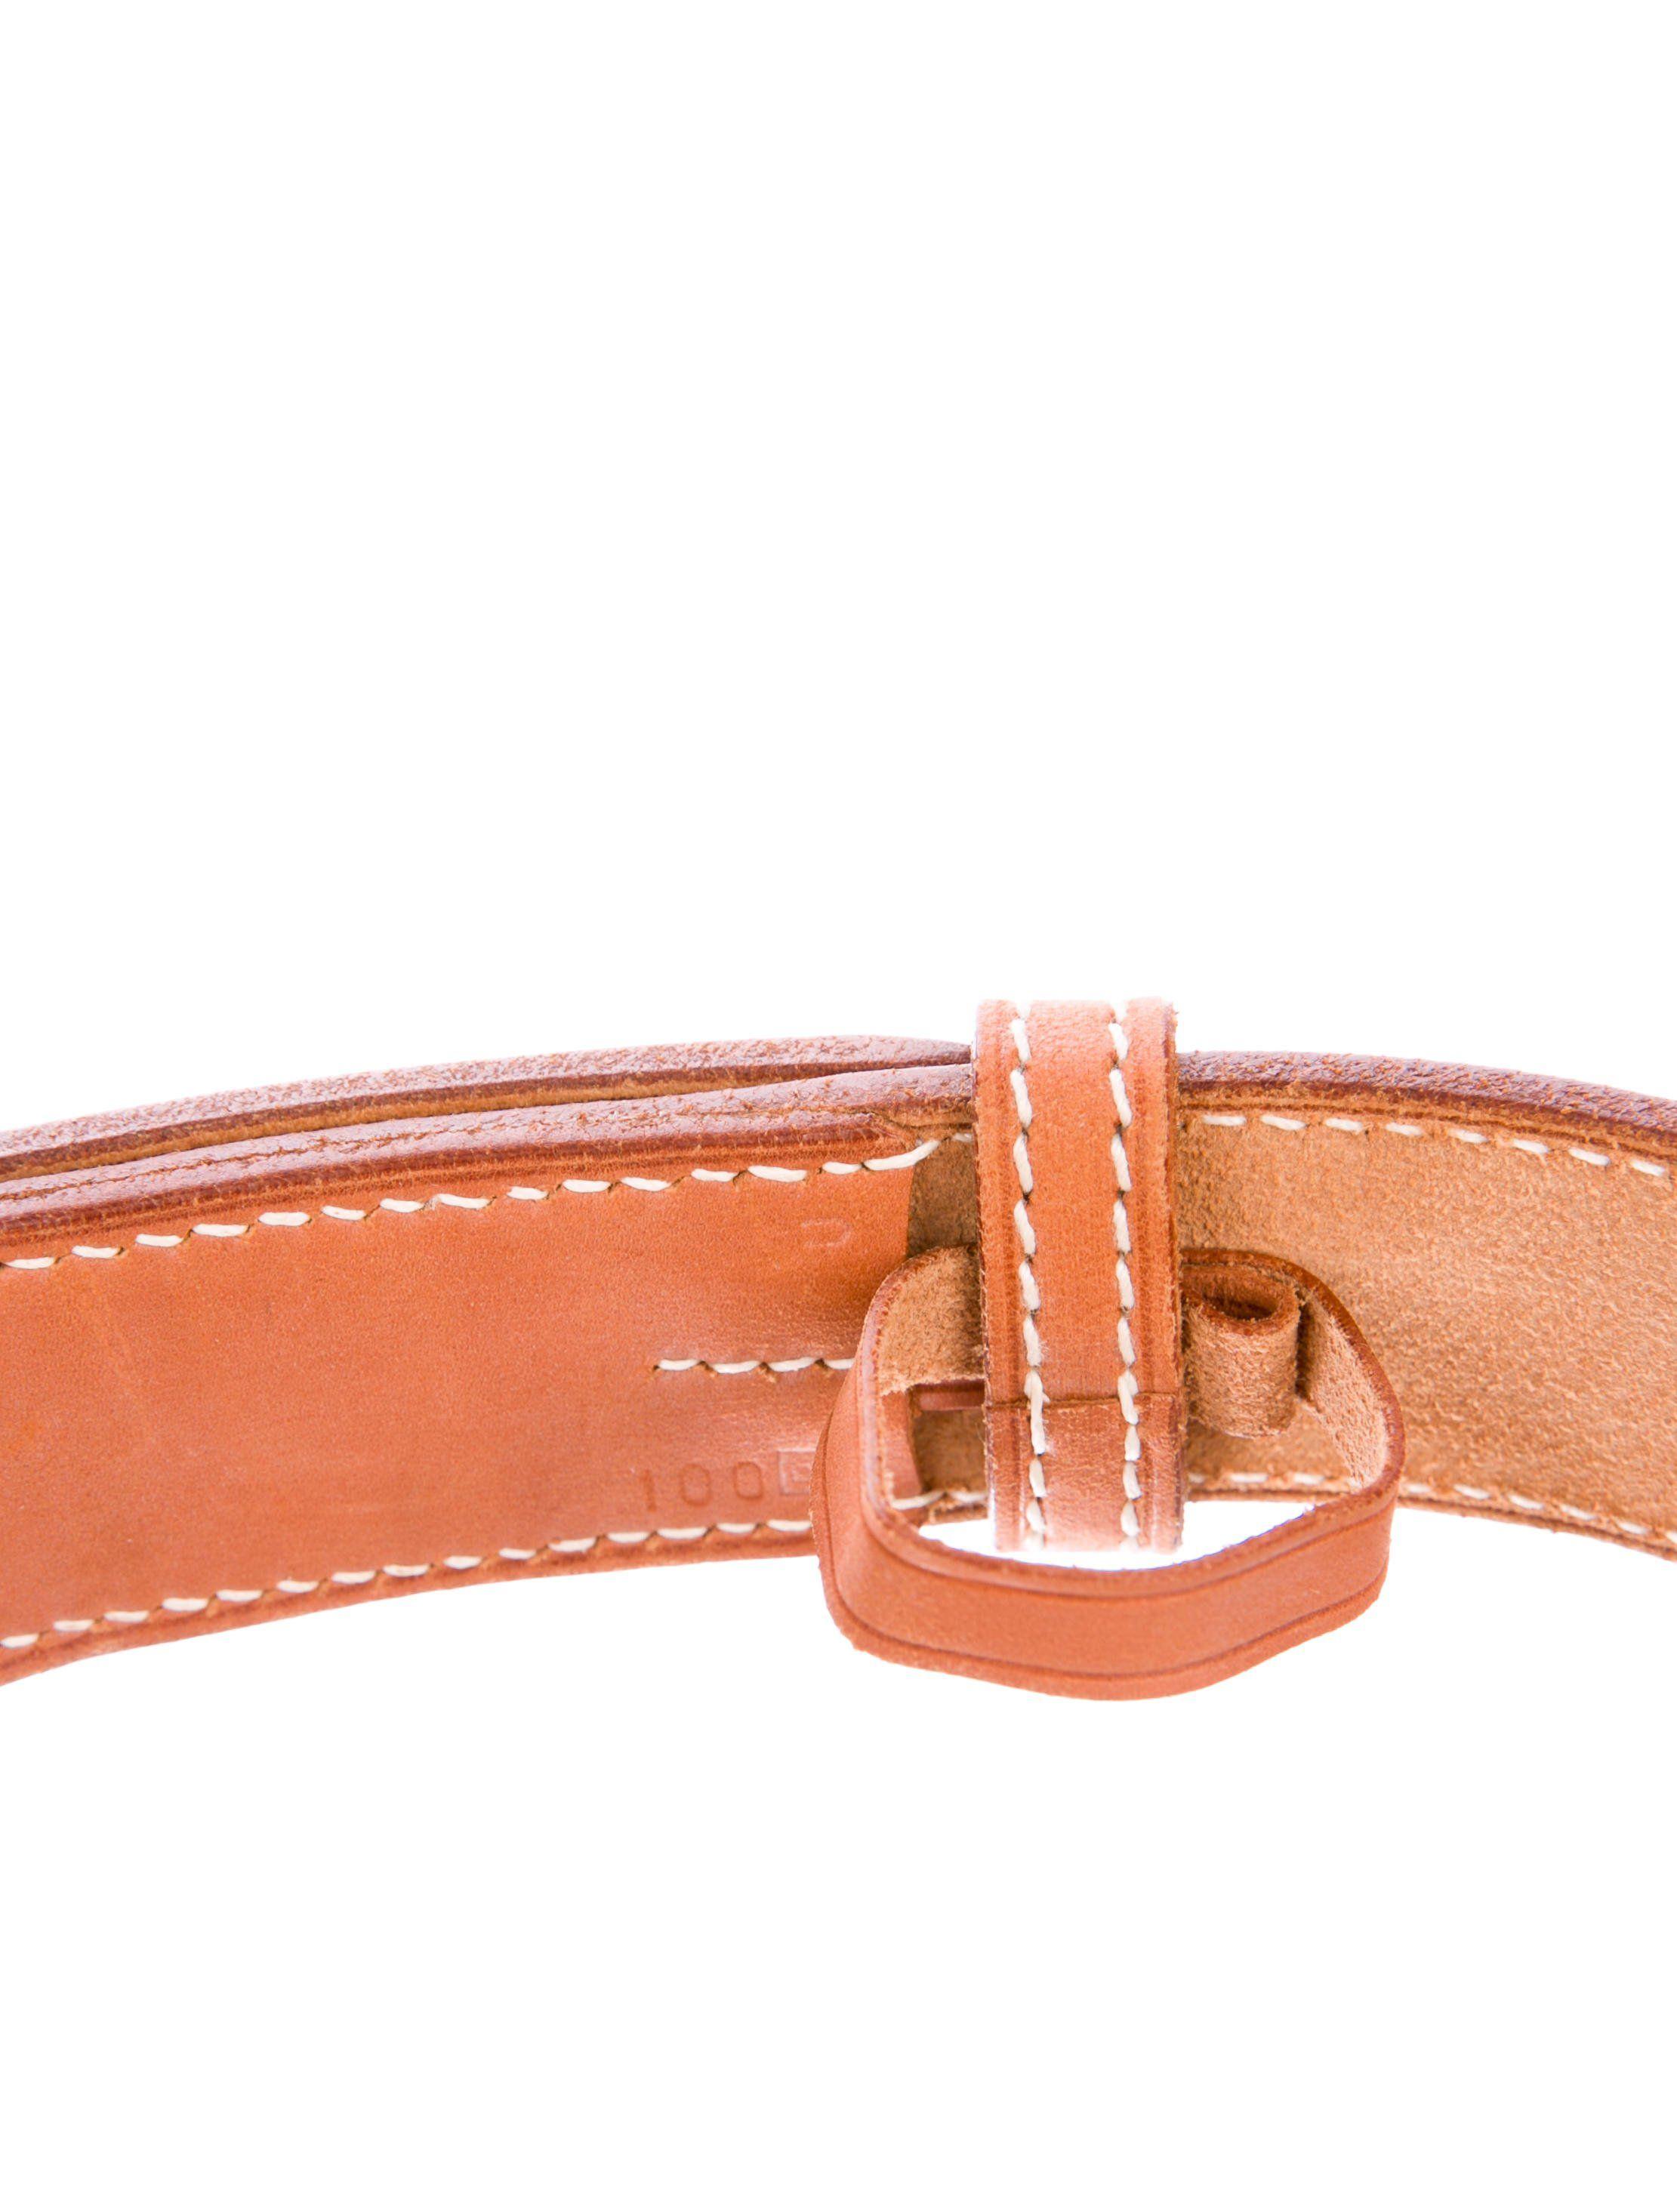 df79024de79e Men s tan Barenia leather Hermès Etriviere belt with palladium-plated  buckle closure. Designer size 100. Blind stamped Square B from 1998.